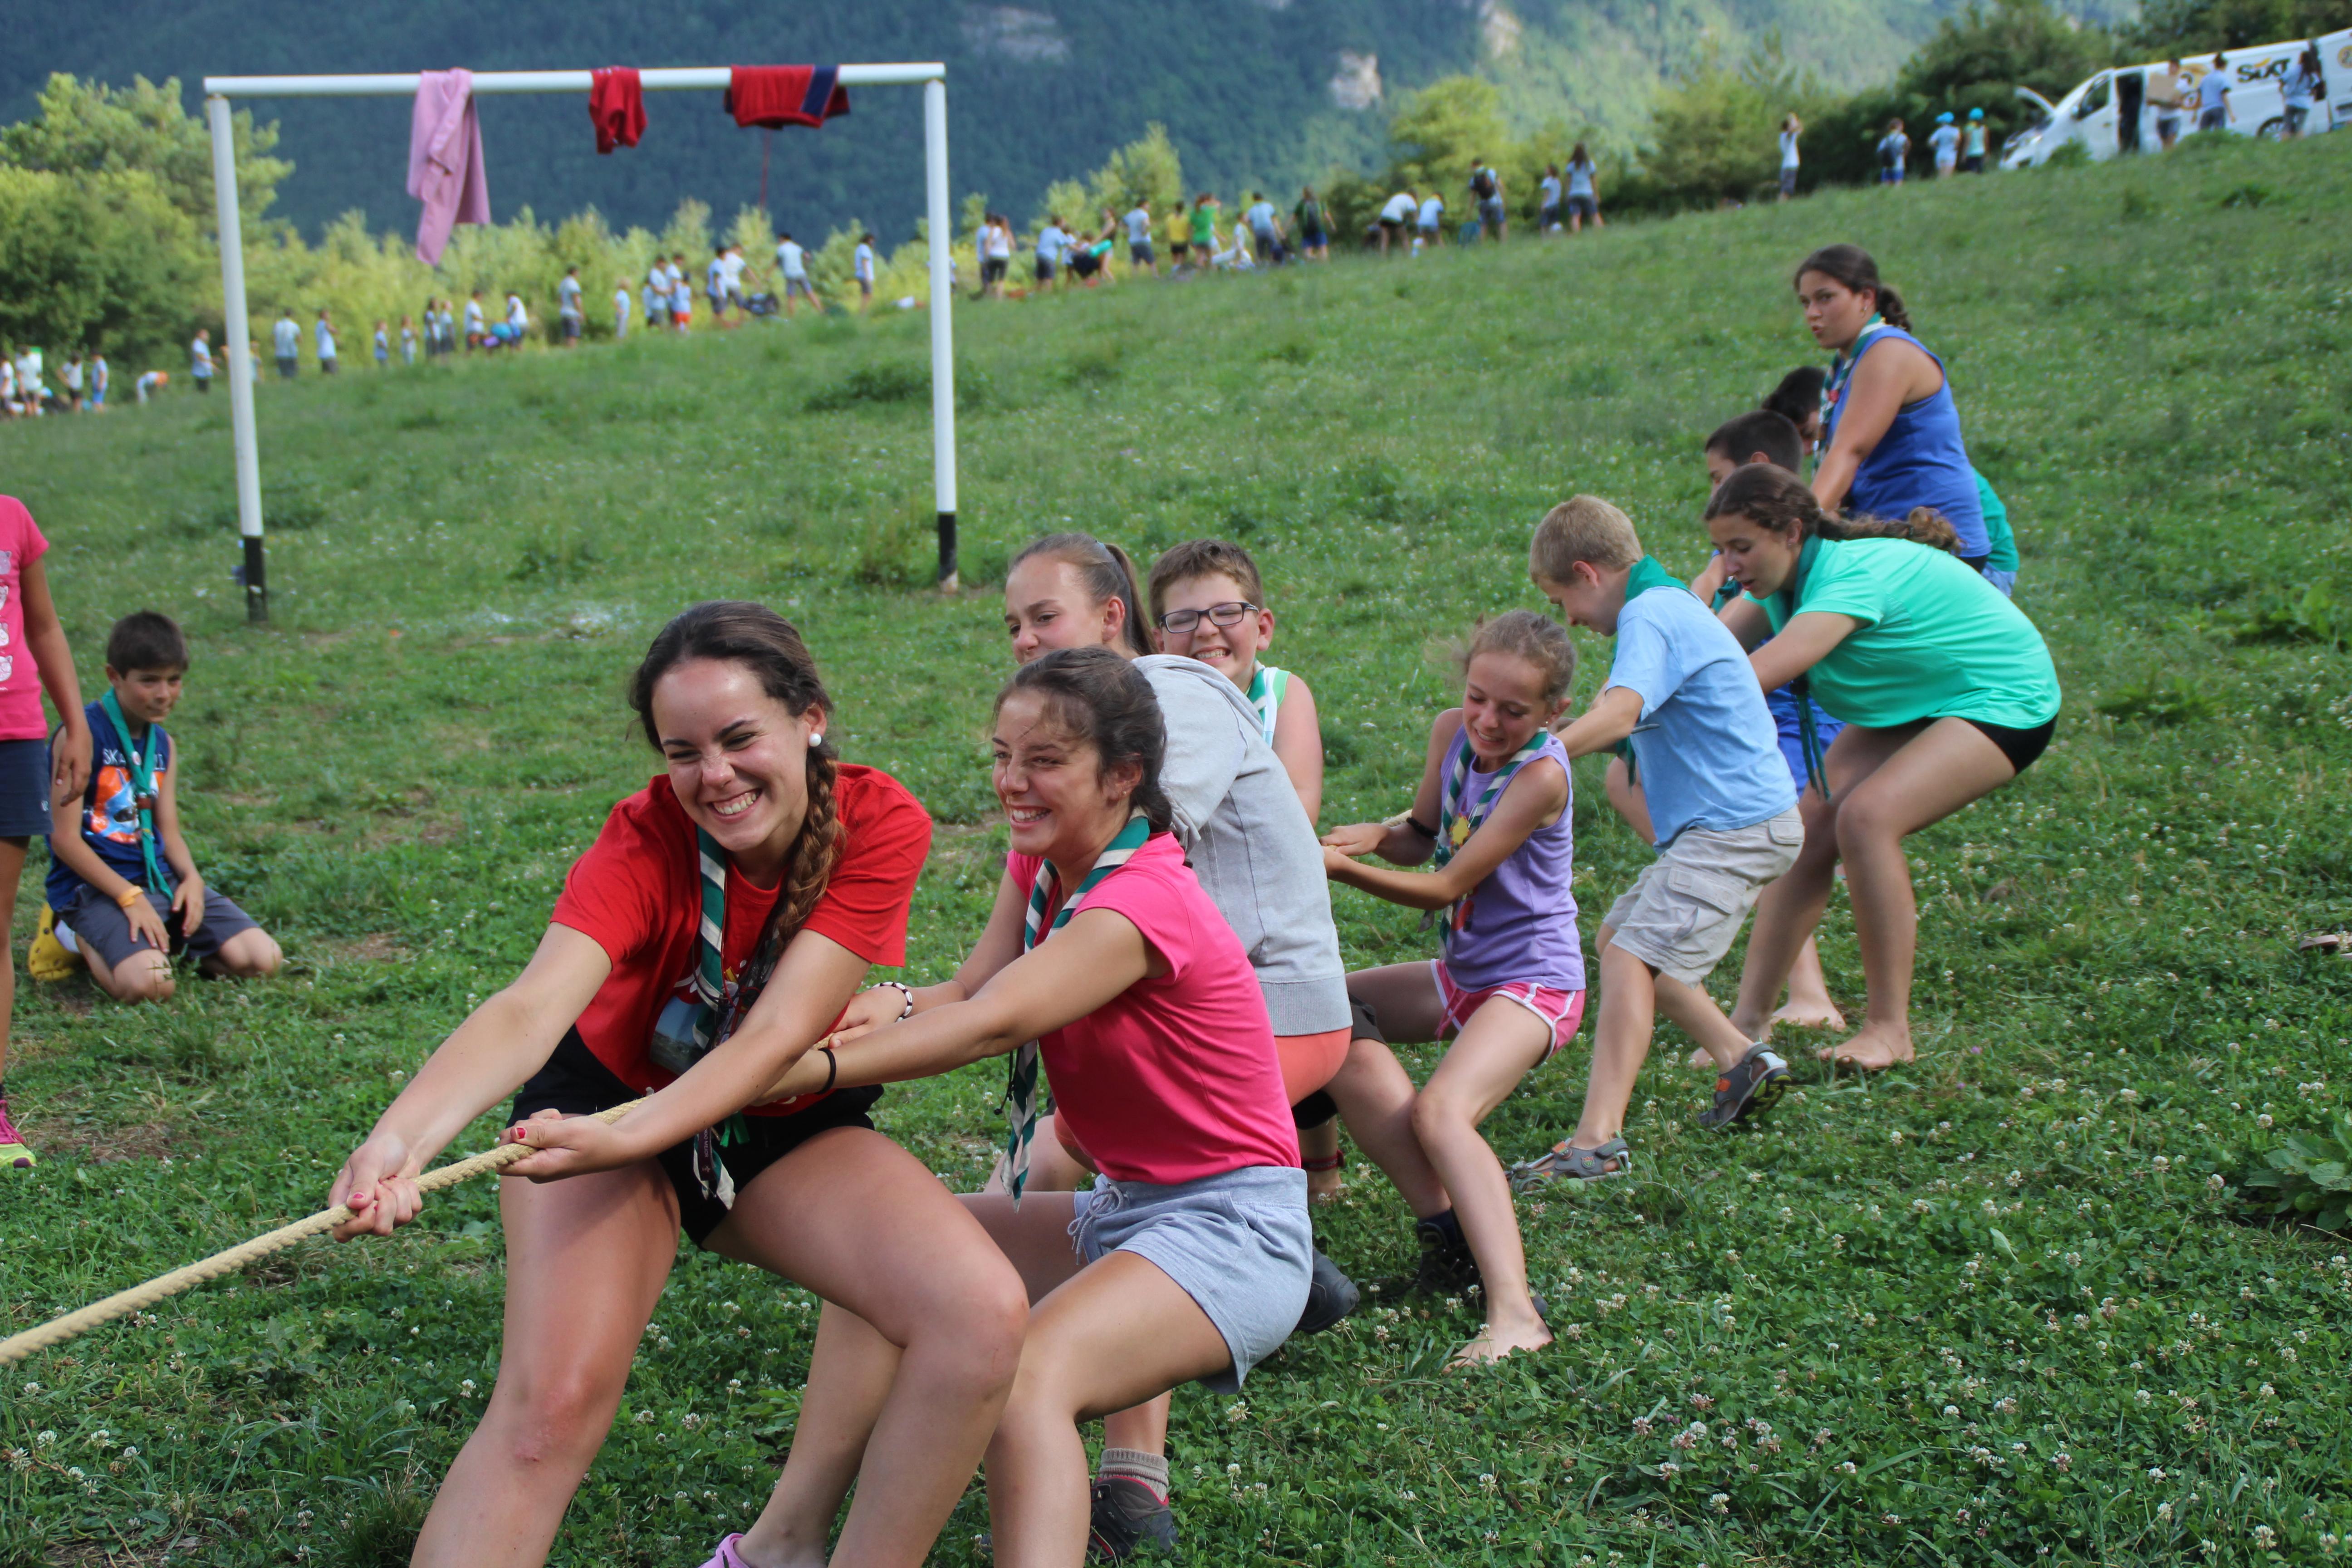 15-16 - Grupo - Campamento de verano - P220